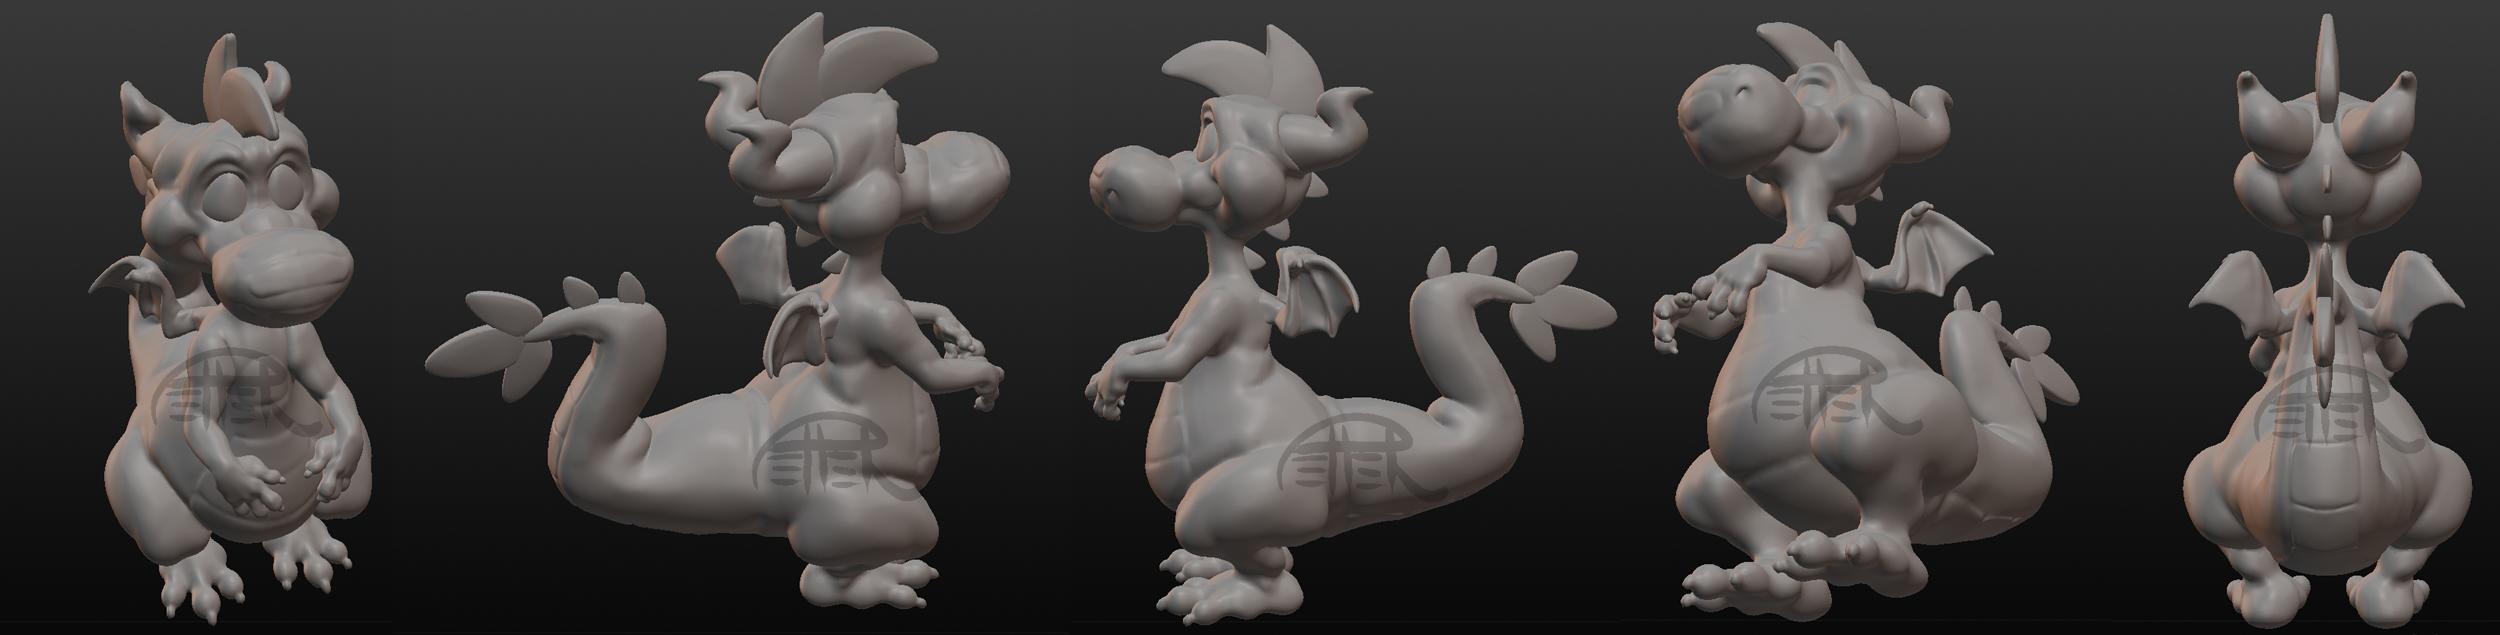 sculpt 2: peepo! by MrsDrPepper